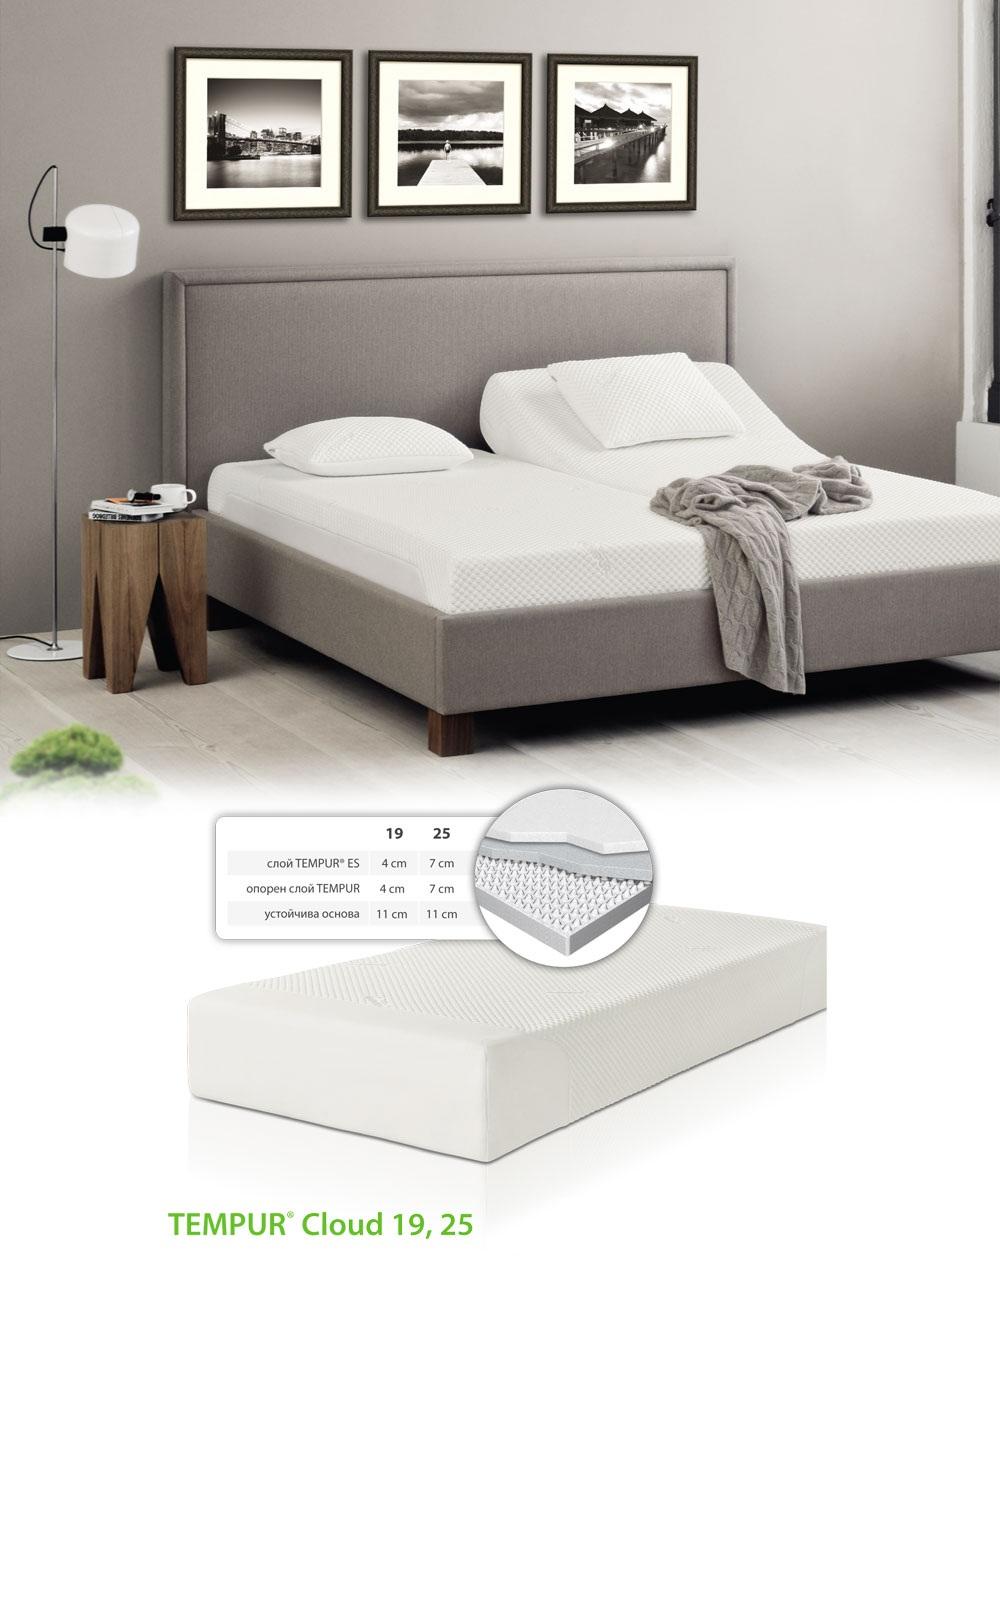 tempur cloud 25 tempur. Black Bedroom Furniture Sets. Home Design Ideas